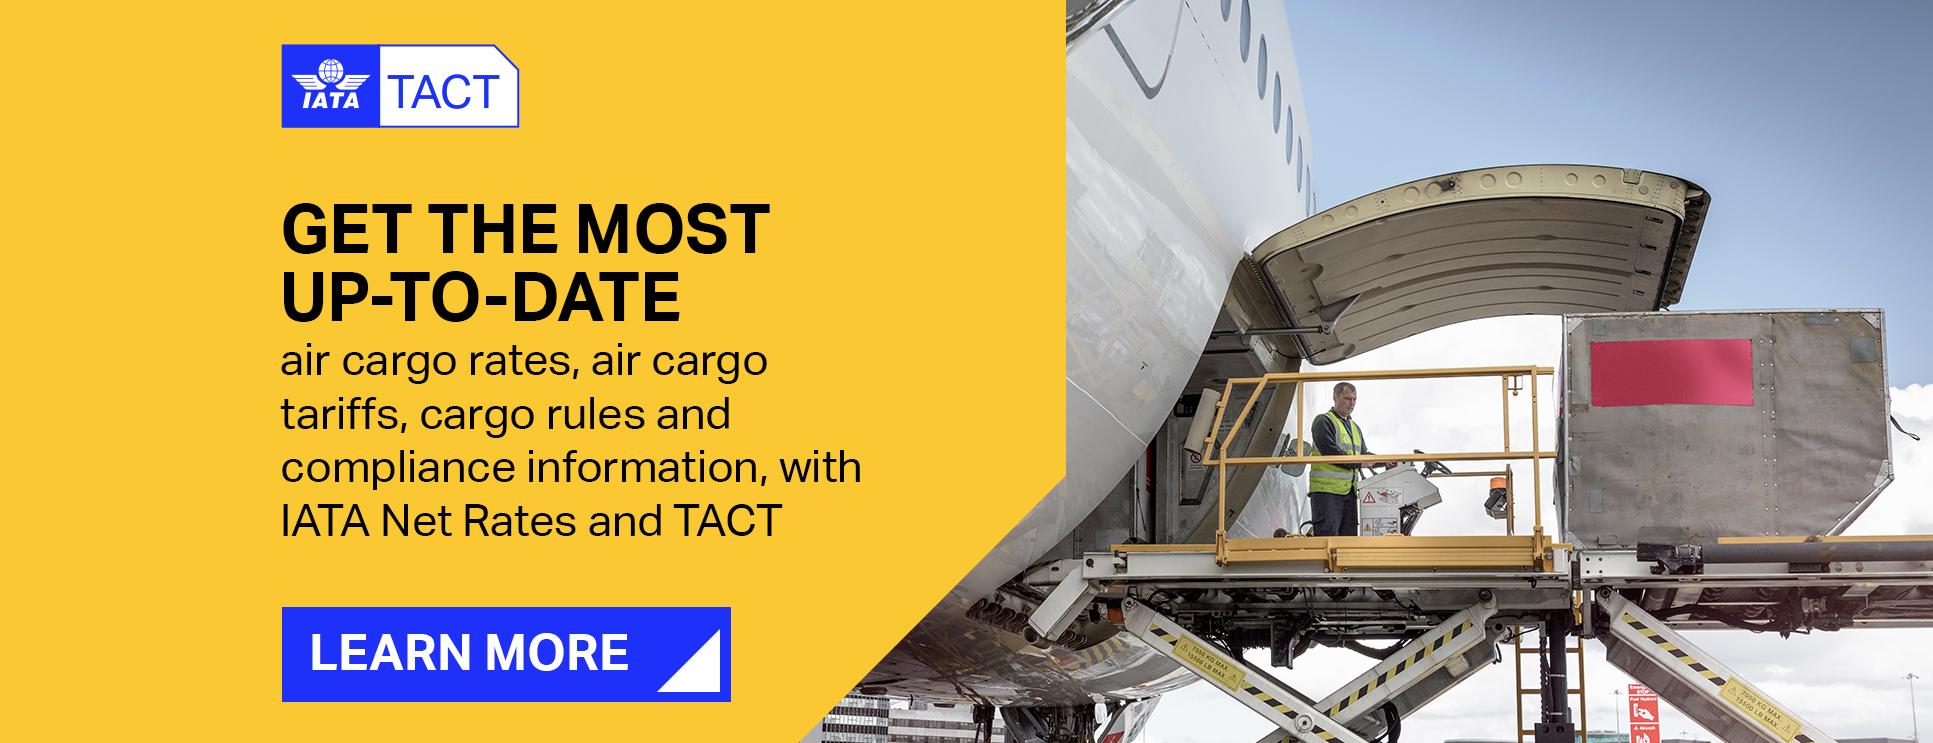 IATA TACT up-to-date